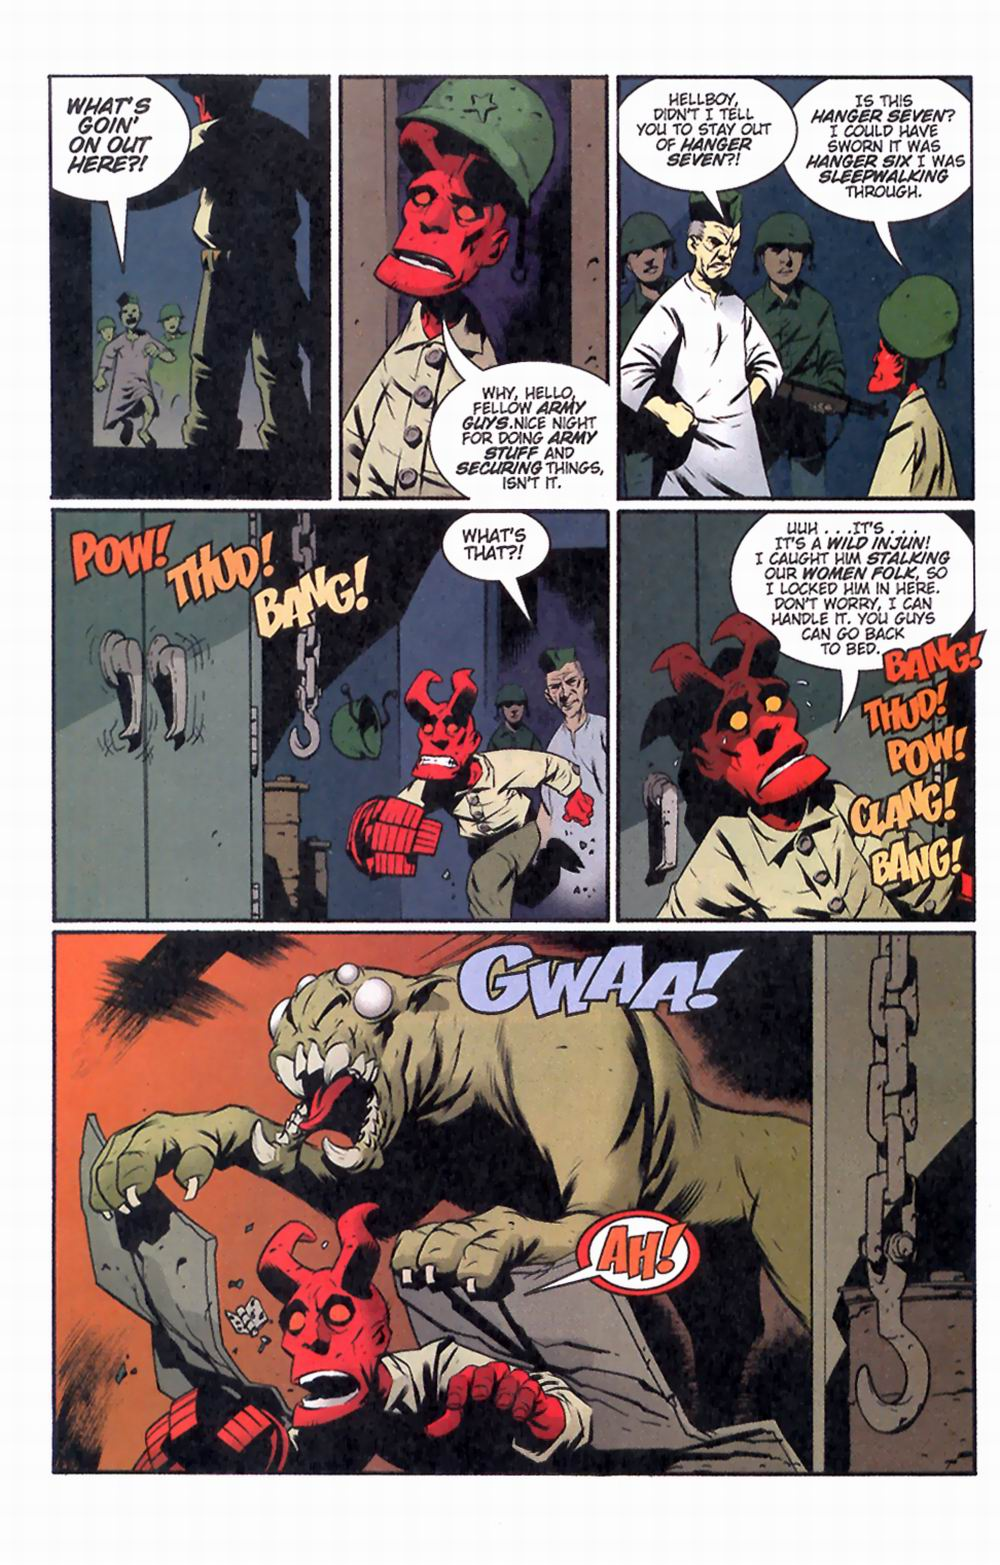 Read online Hellboy: Weird Tales comic -  Issue #2 - 28